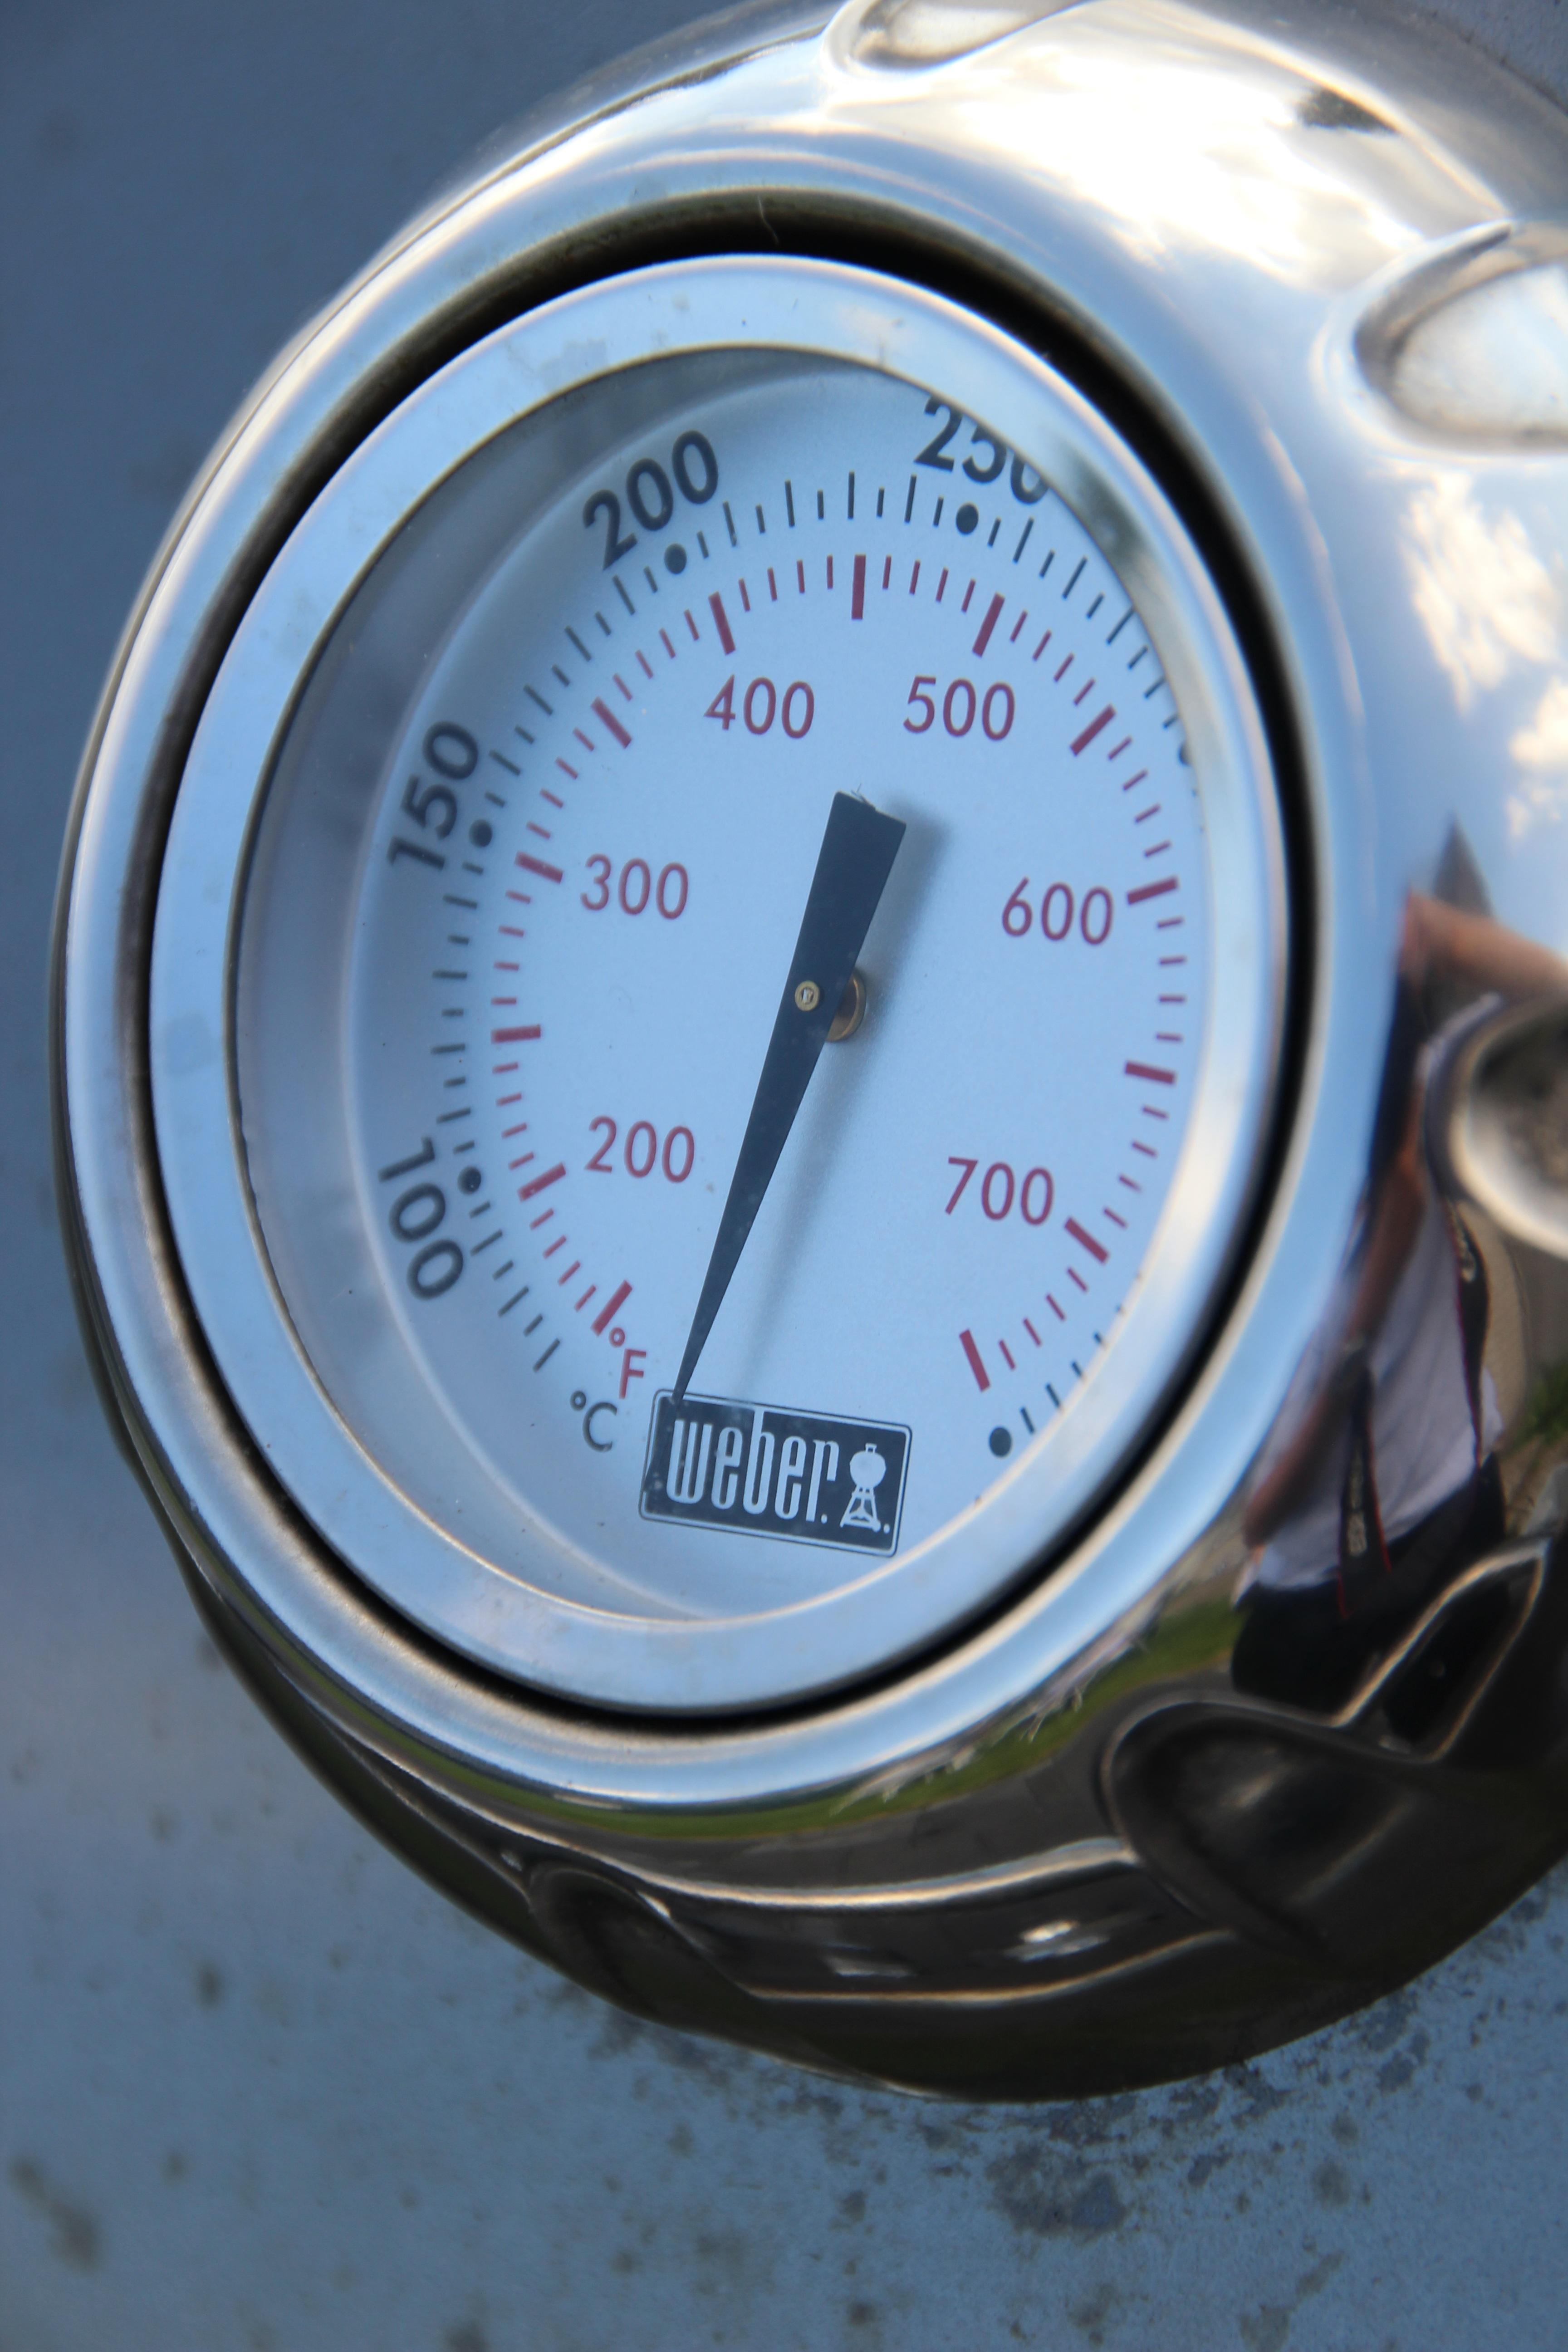 Sensationelle Gratis billeder : hjul, annonce, Målestok, speedometer XR71